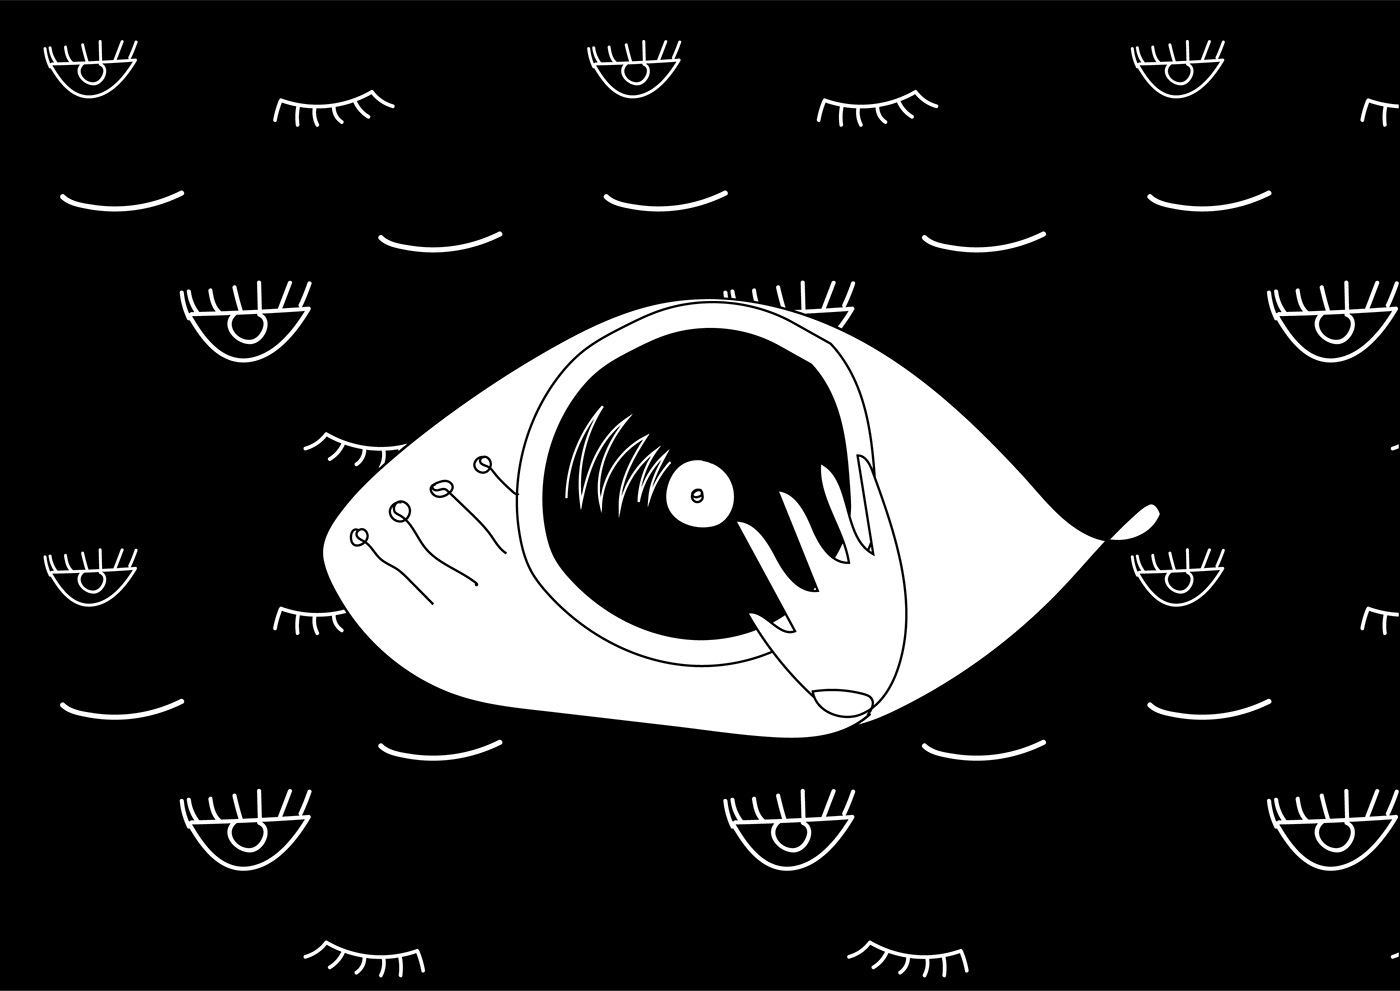 Citește un interviu cu Irina Moroșan, artista care a realizat imaginea seriei de petreceri Lunar / Irina Morosan Musical cliches